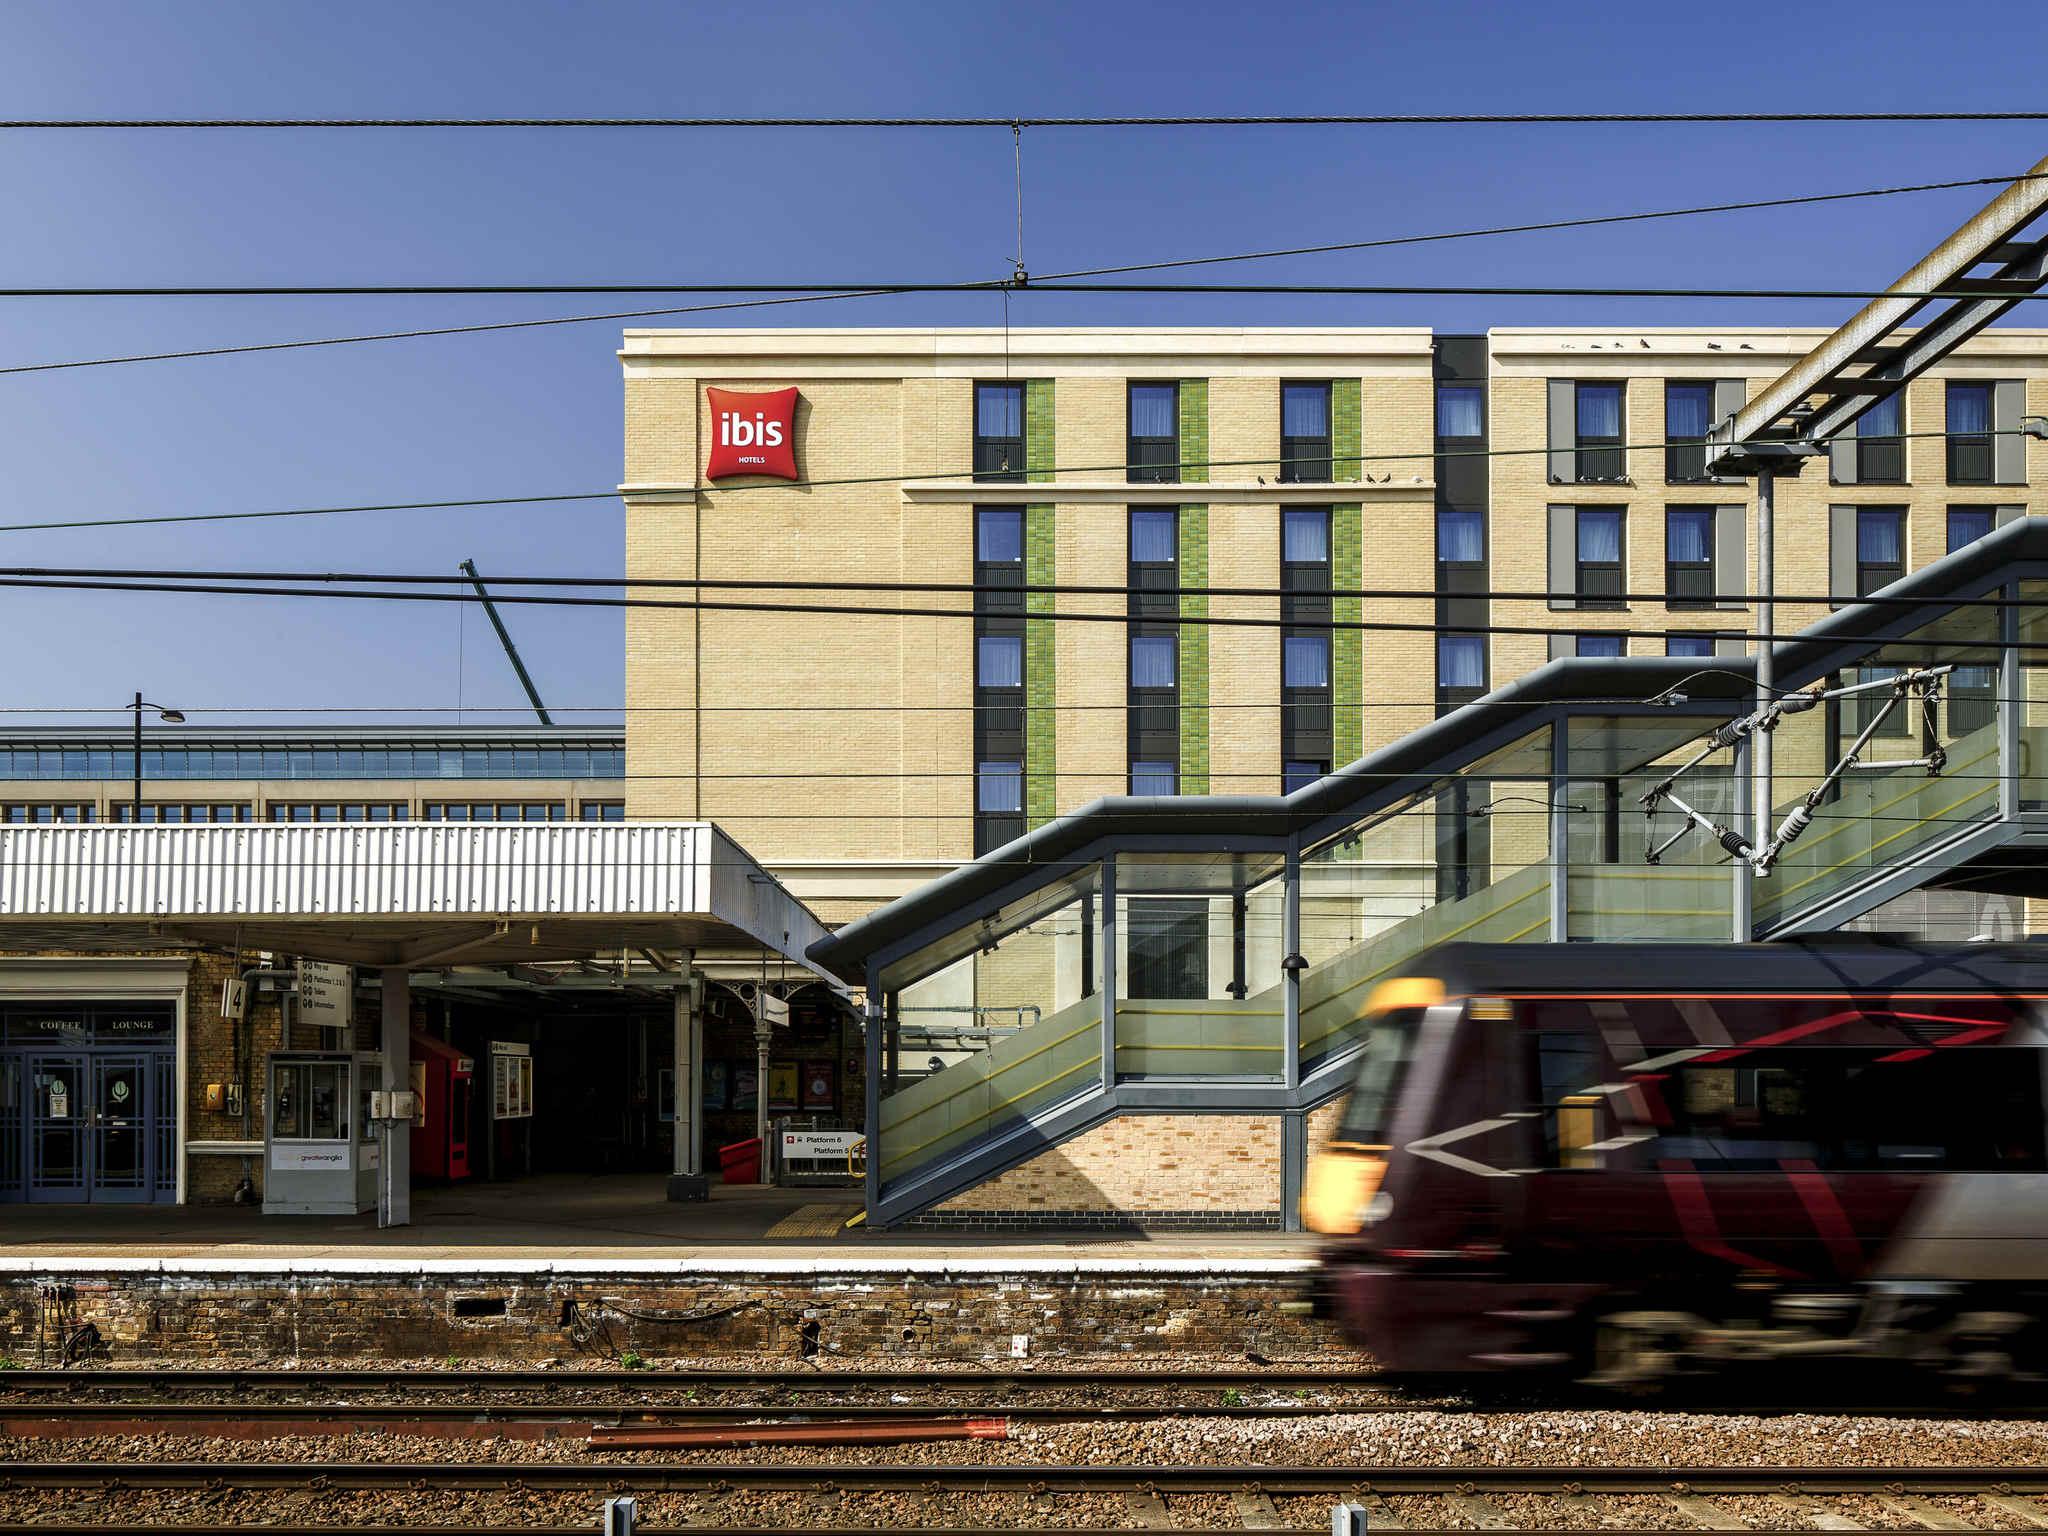 Hotel Ibis Cambridge Central Station